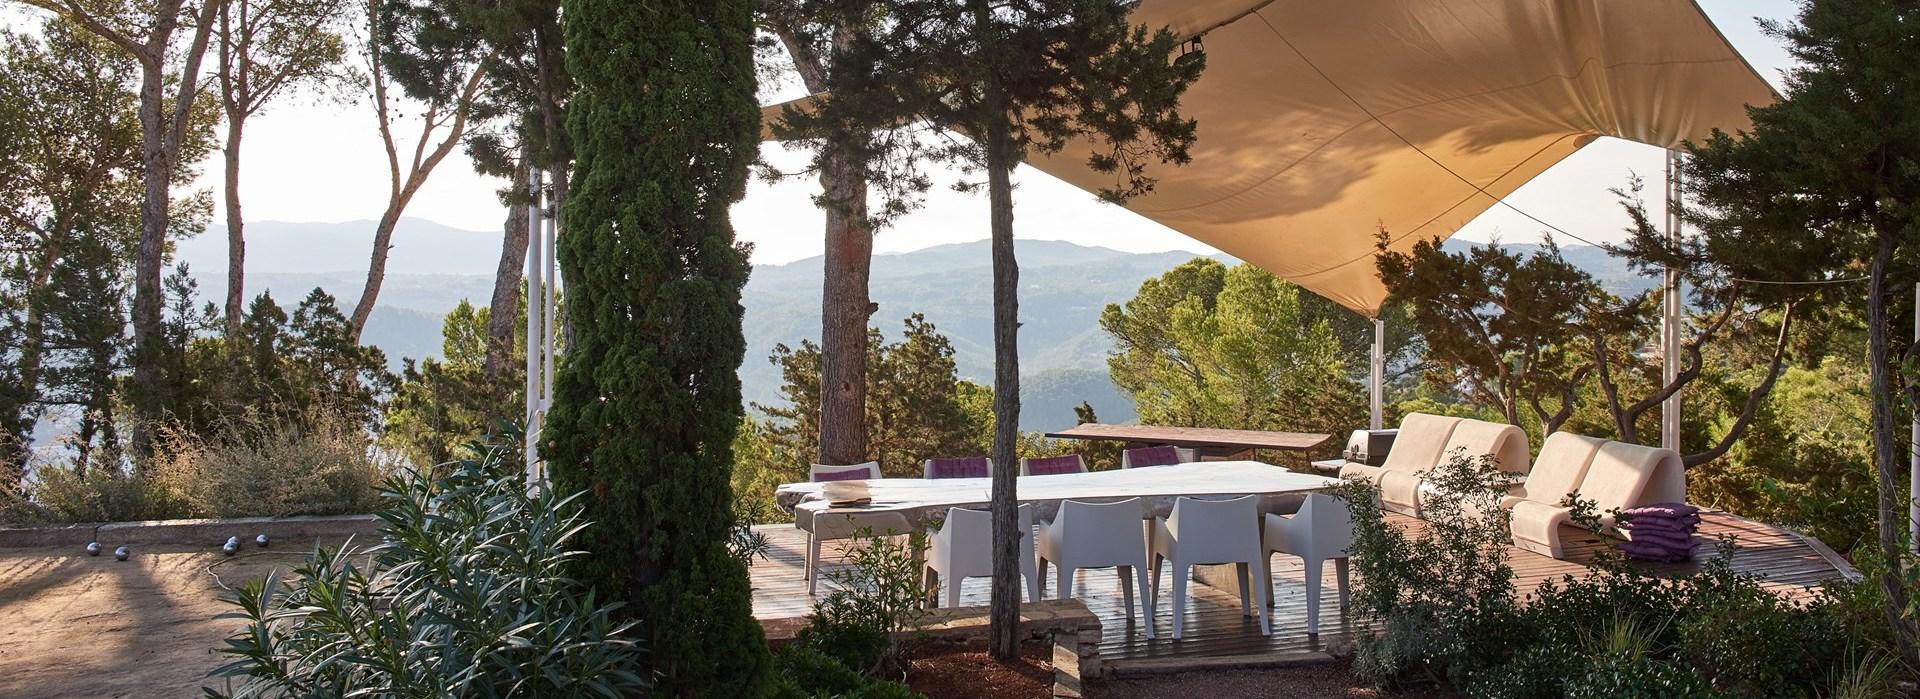 outdoor-dining-villa-can-castello